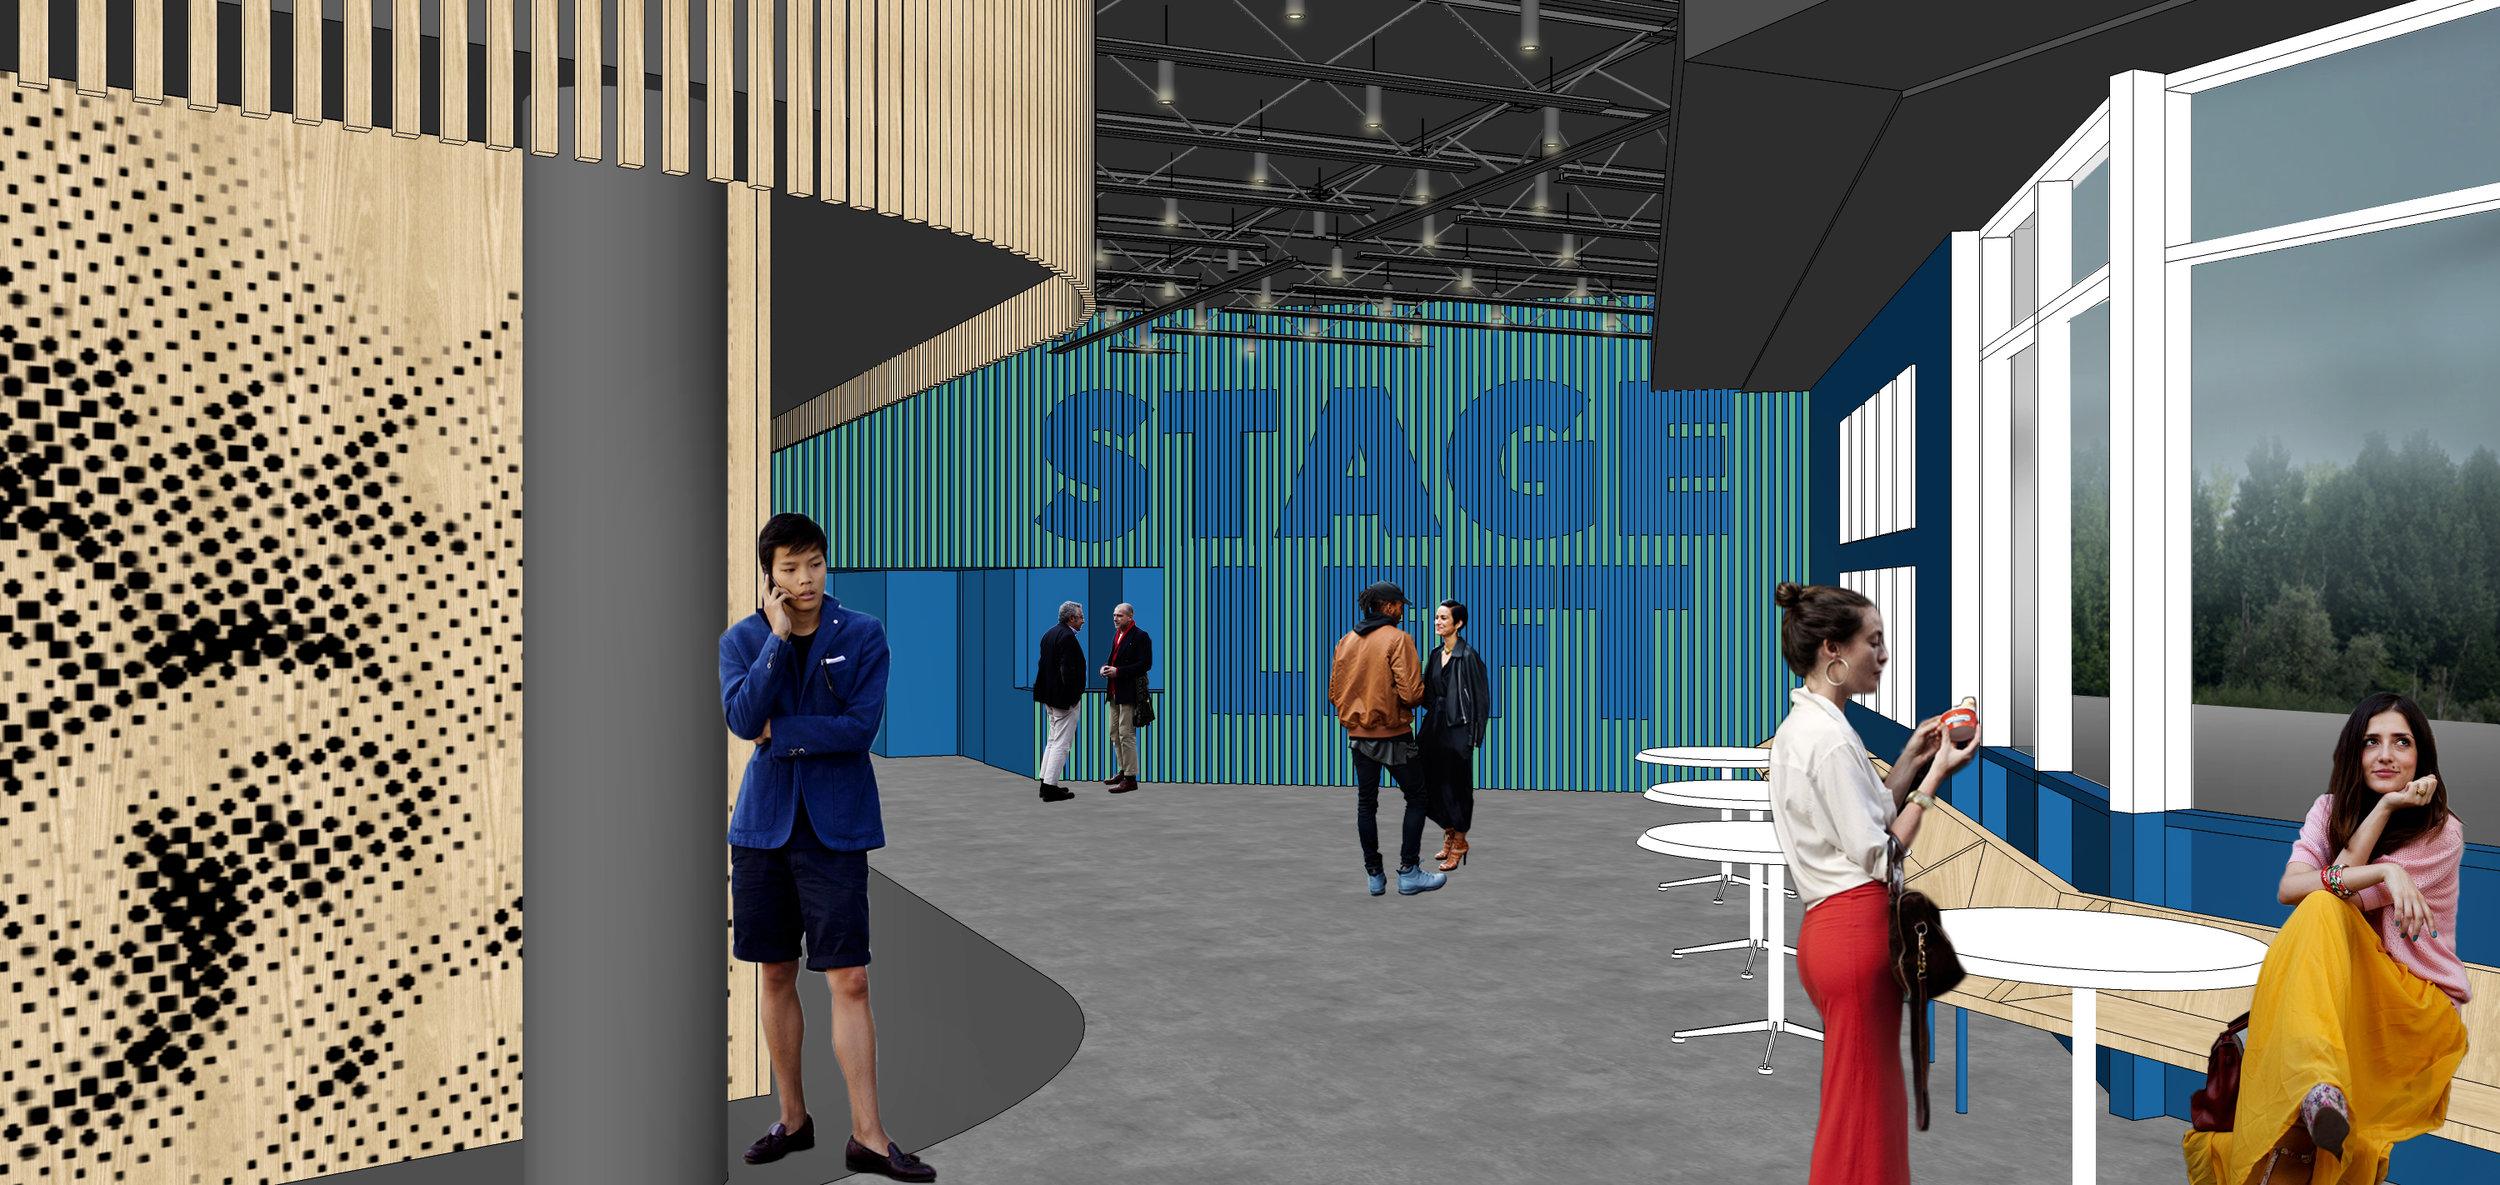 stage left 1.jpg